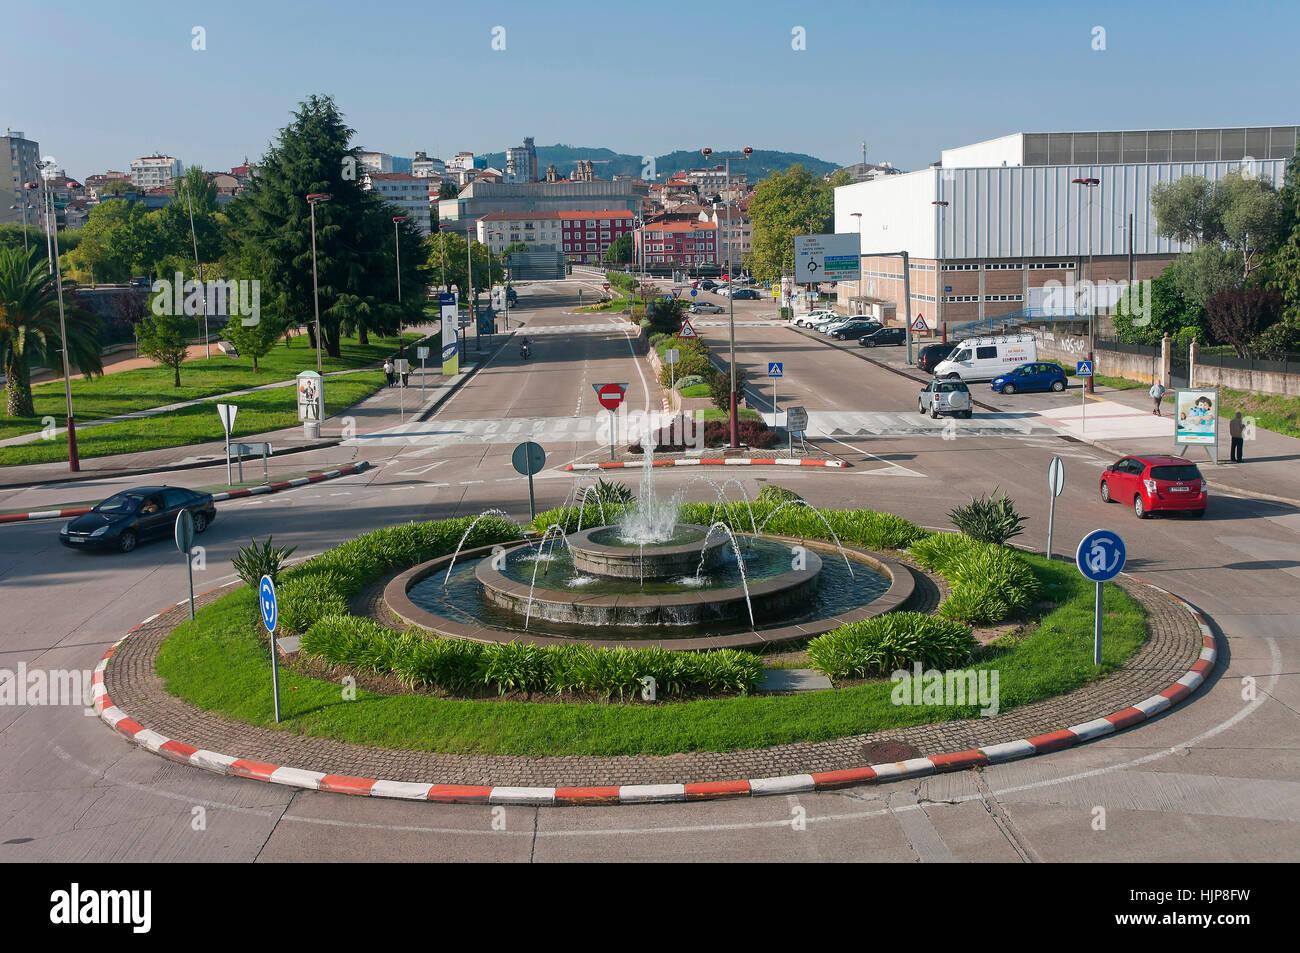 Compostela avenue - roundabout with fountain, Pontevedra, Region of Galicia, Spain, Europe - Stock Image